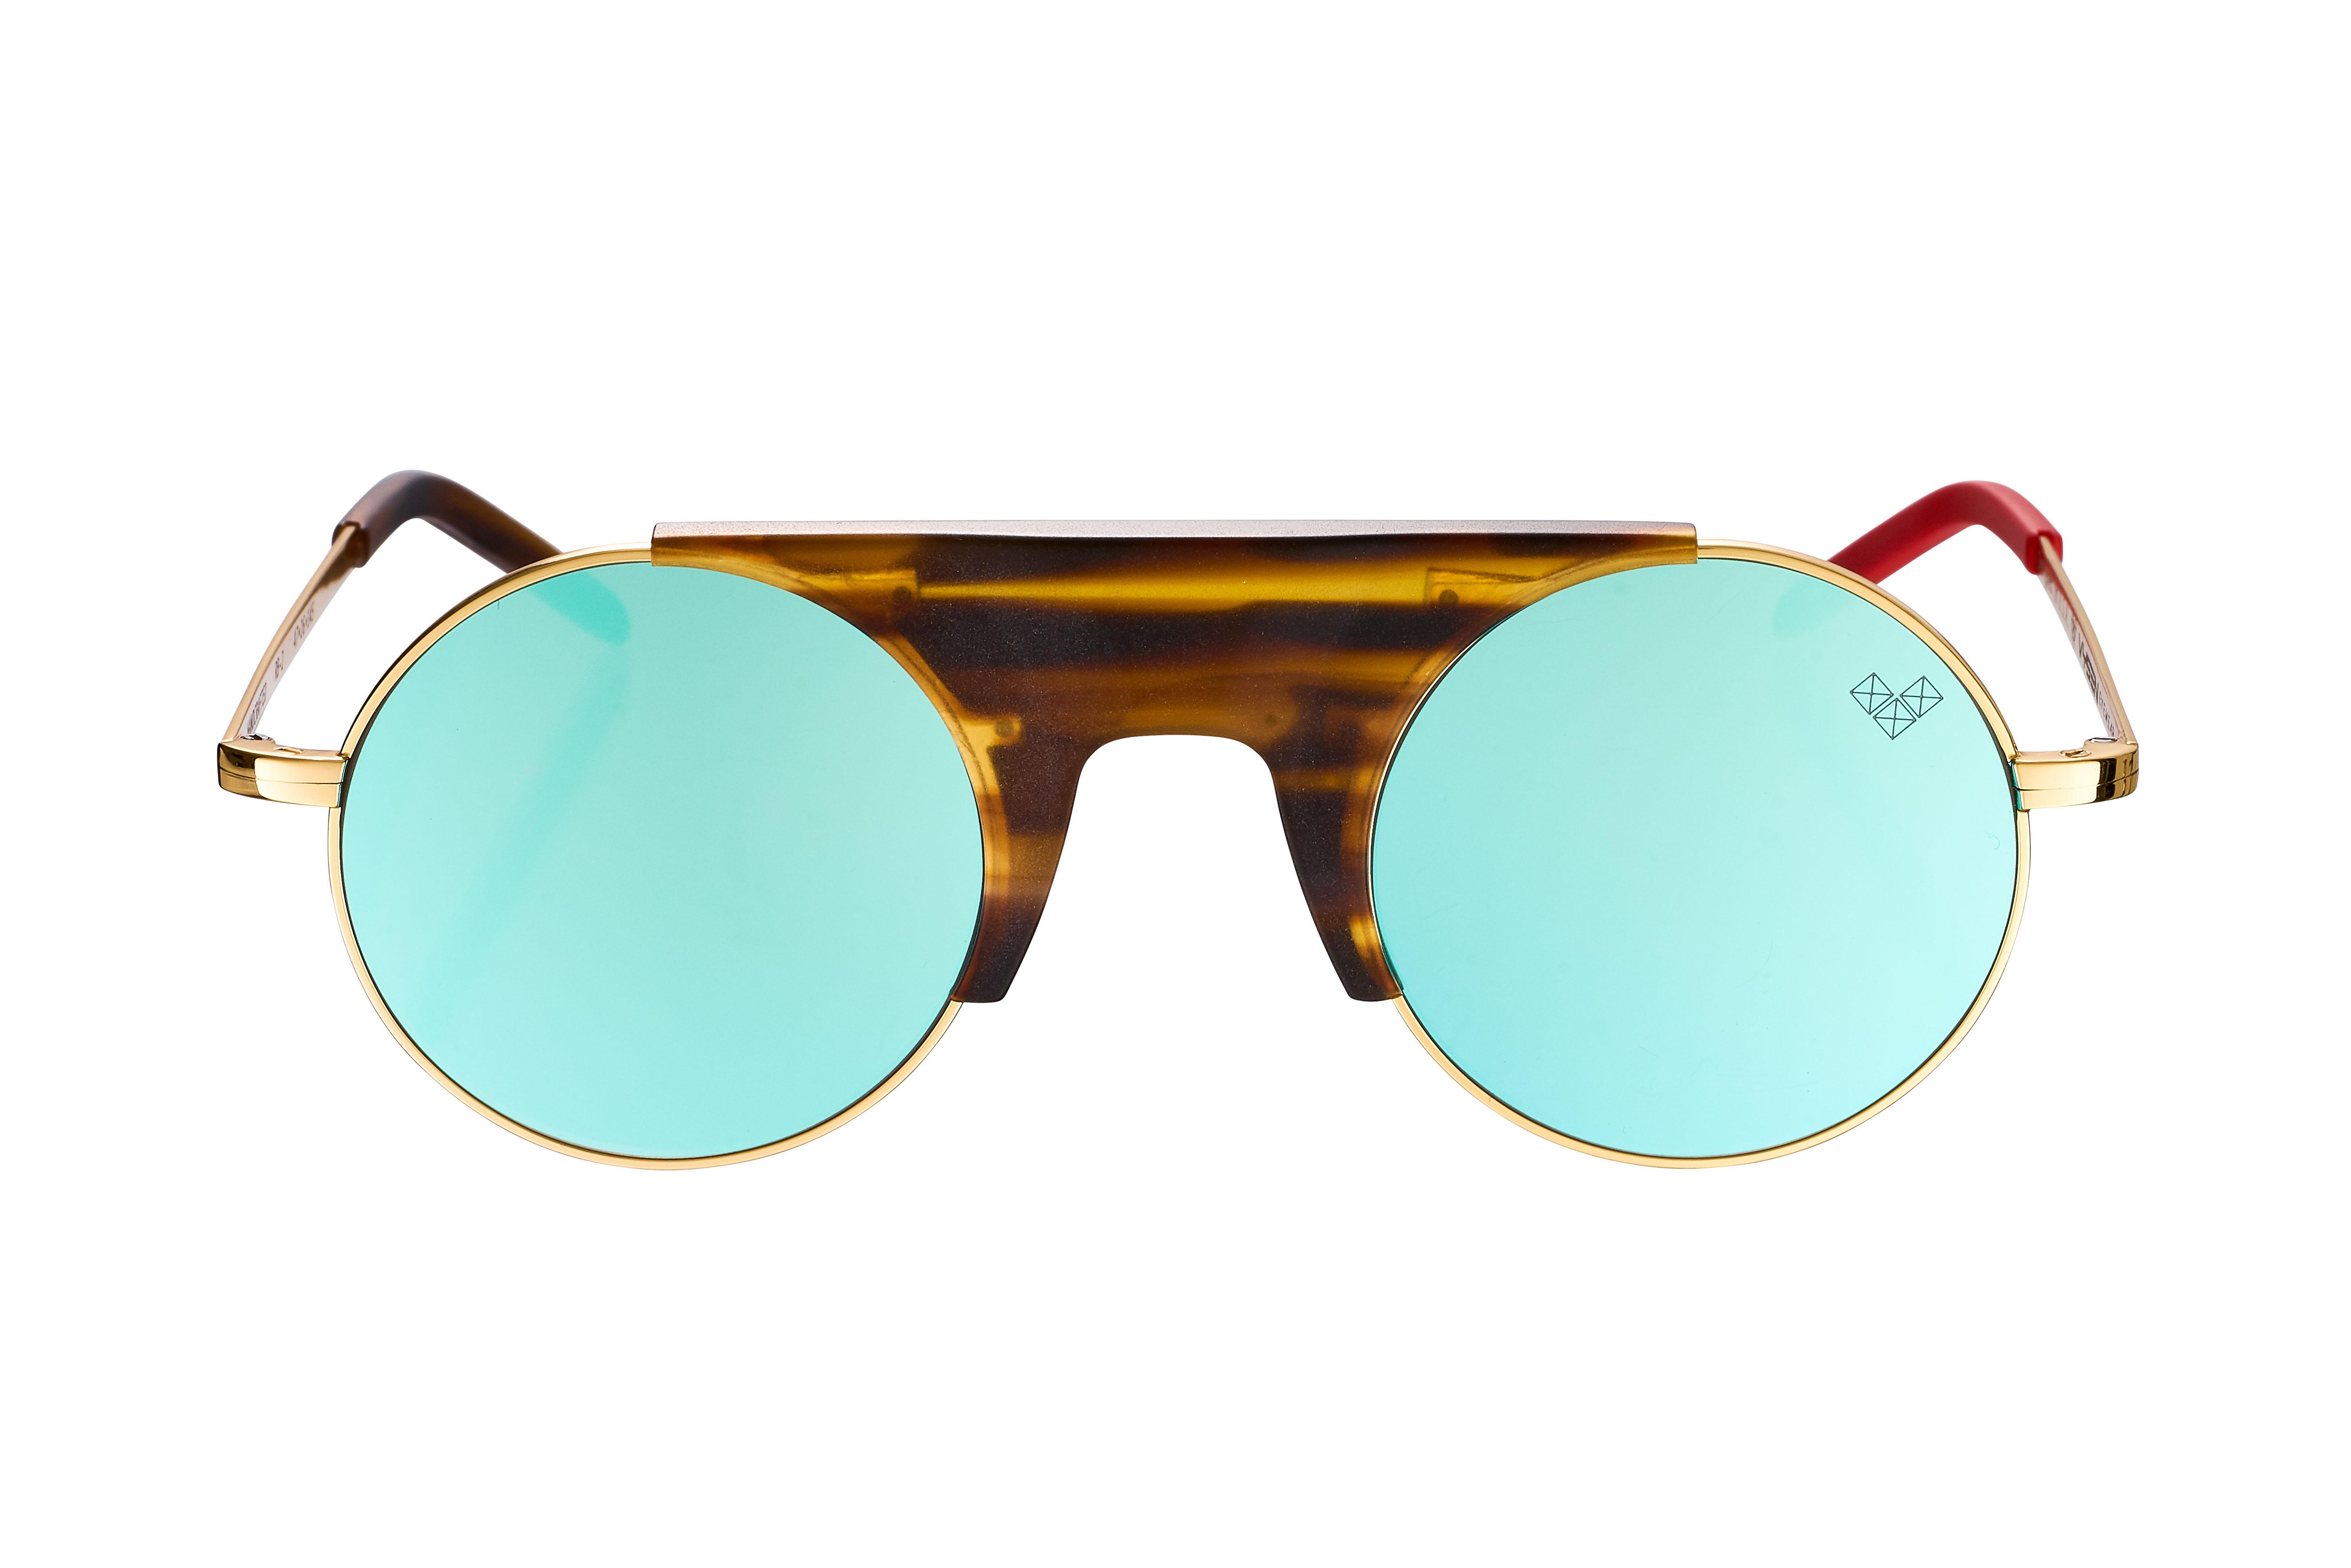 RUBI-Rb-2 - Matte Brown Wood-Patterned Center Piece - Blue Mirror Lenses